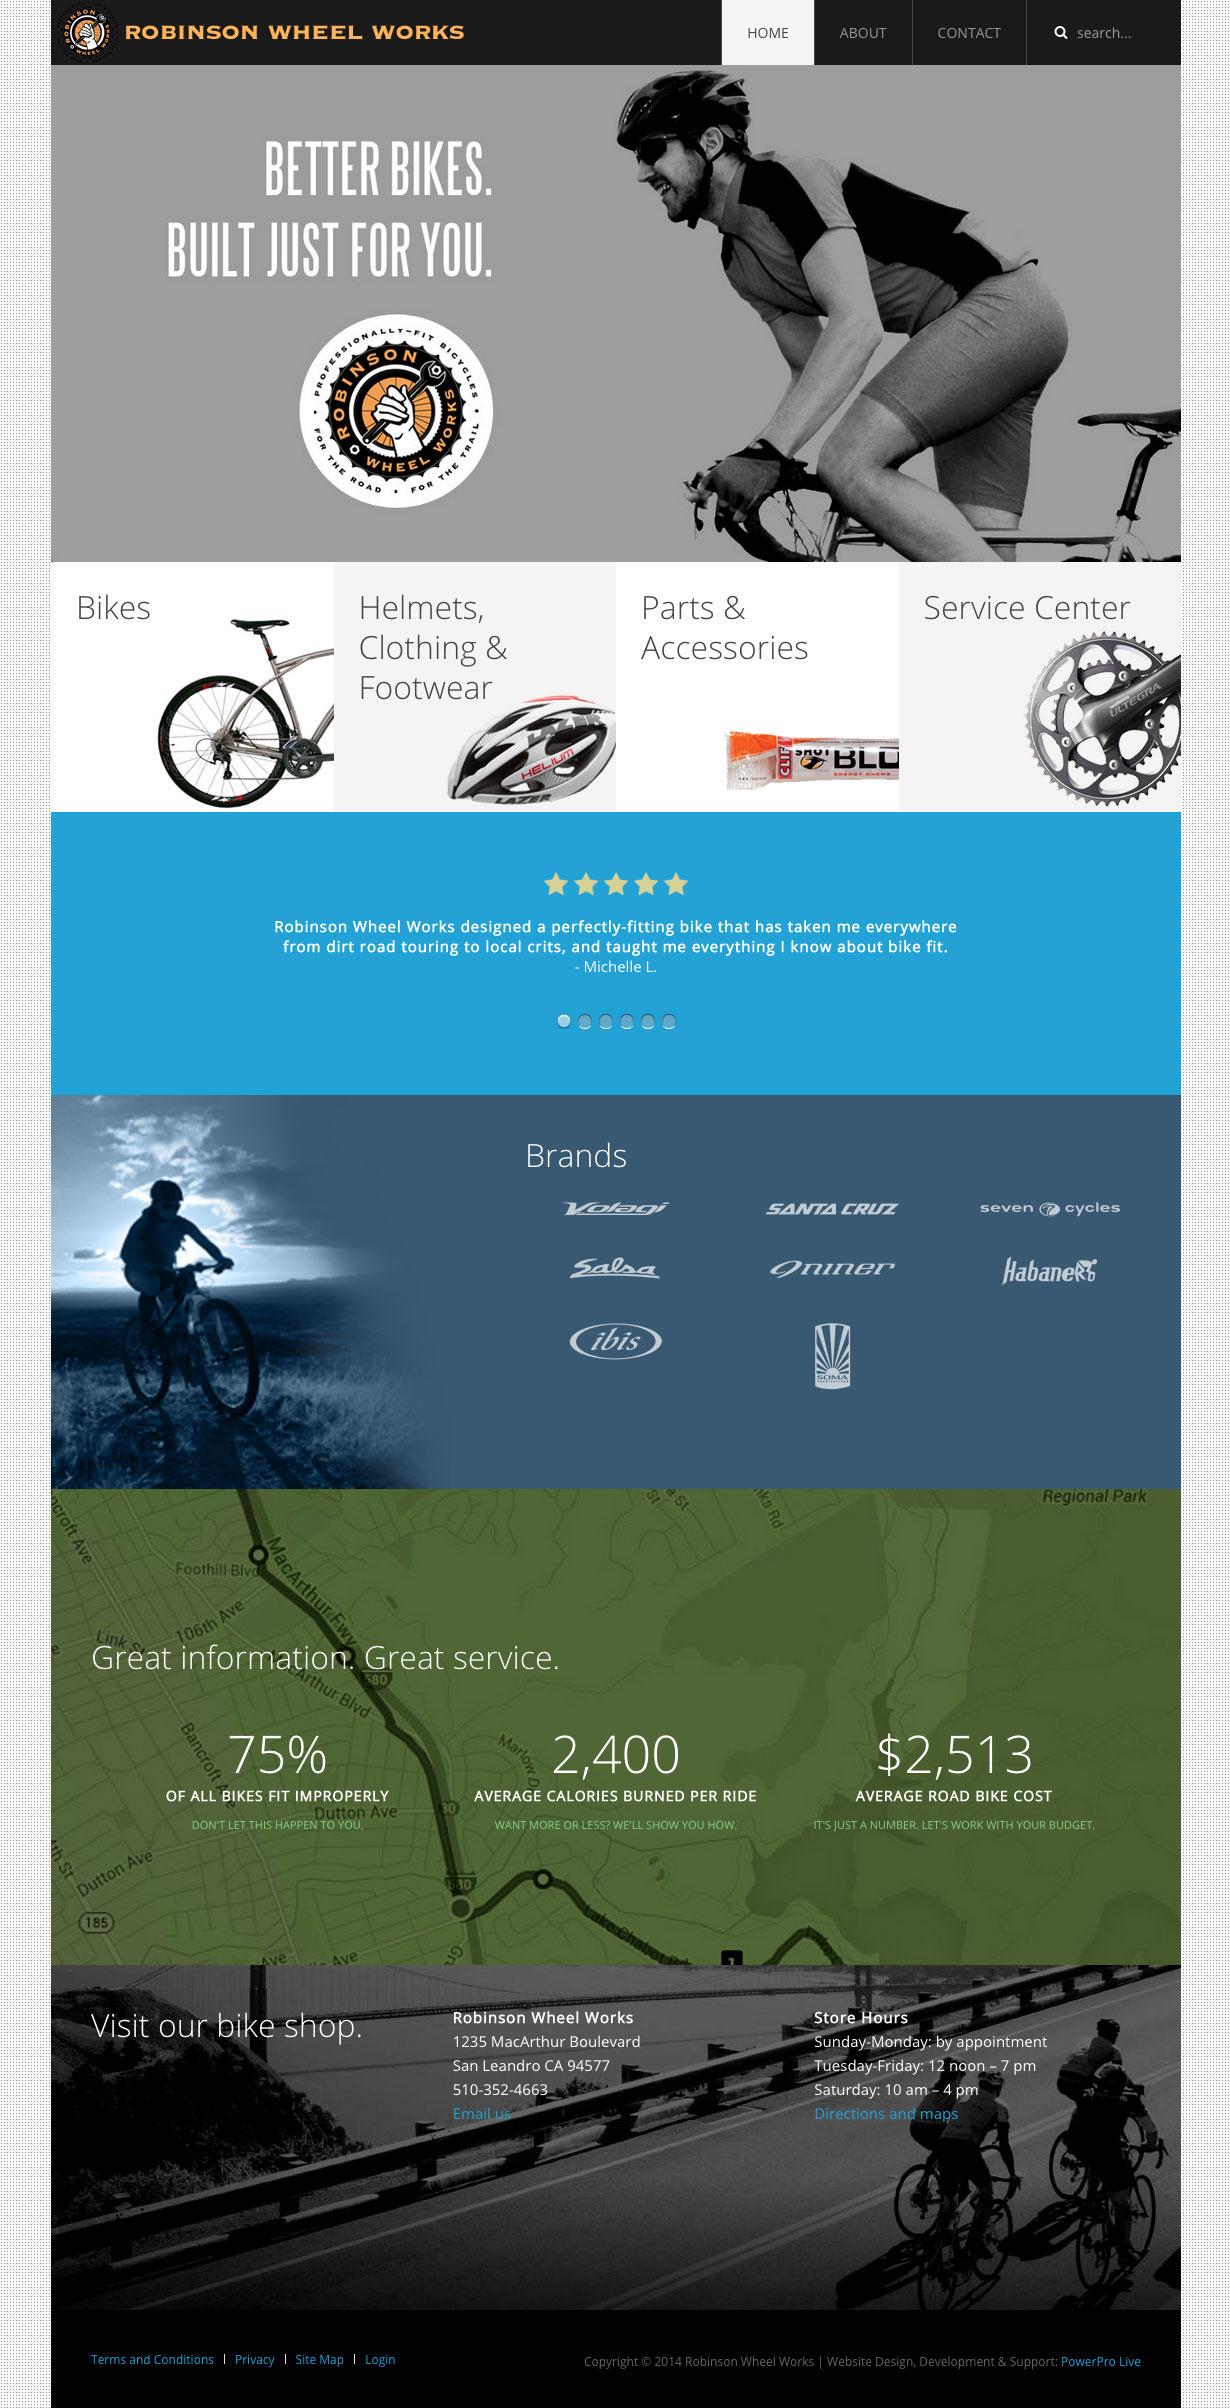 robinson-wheel-works-website